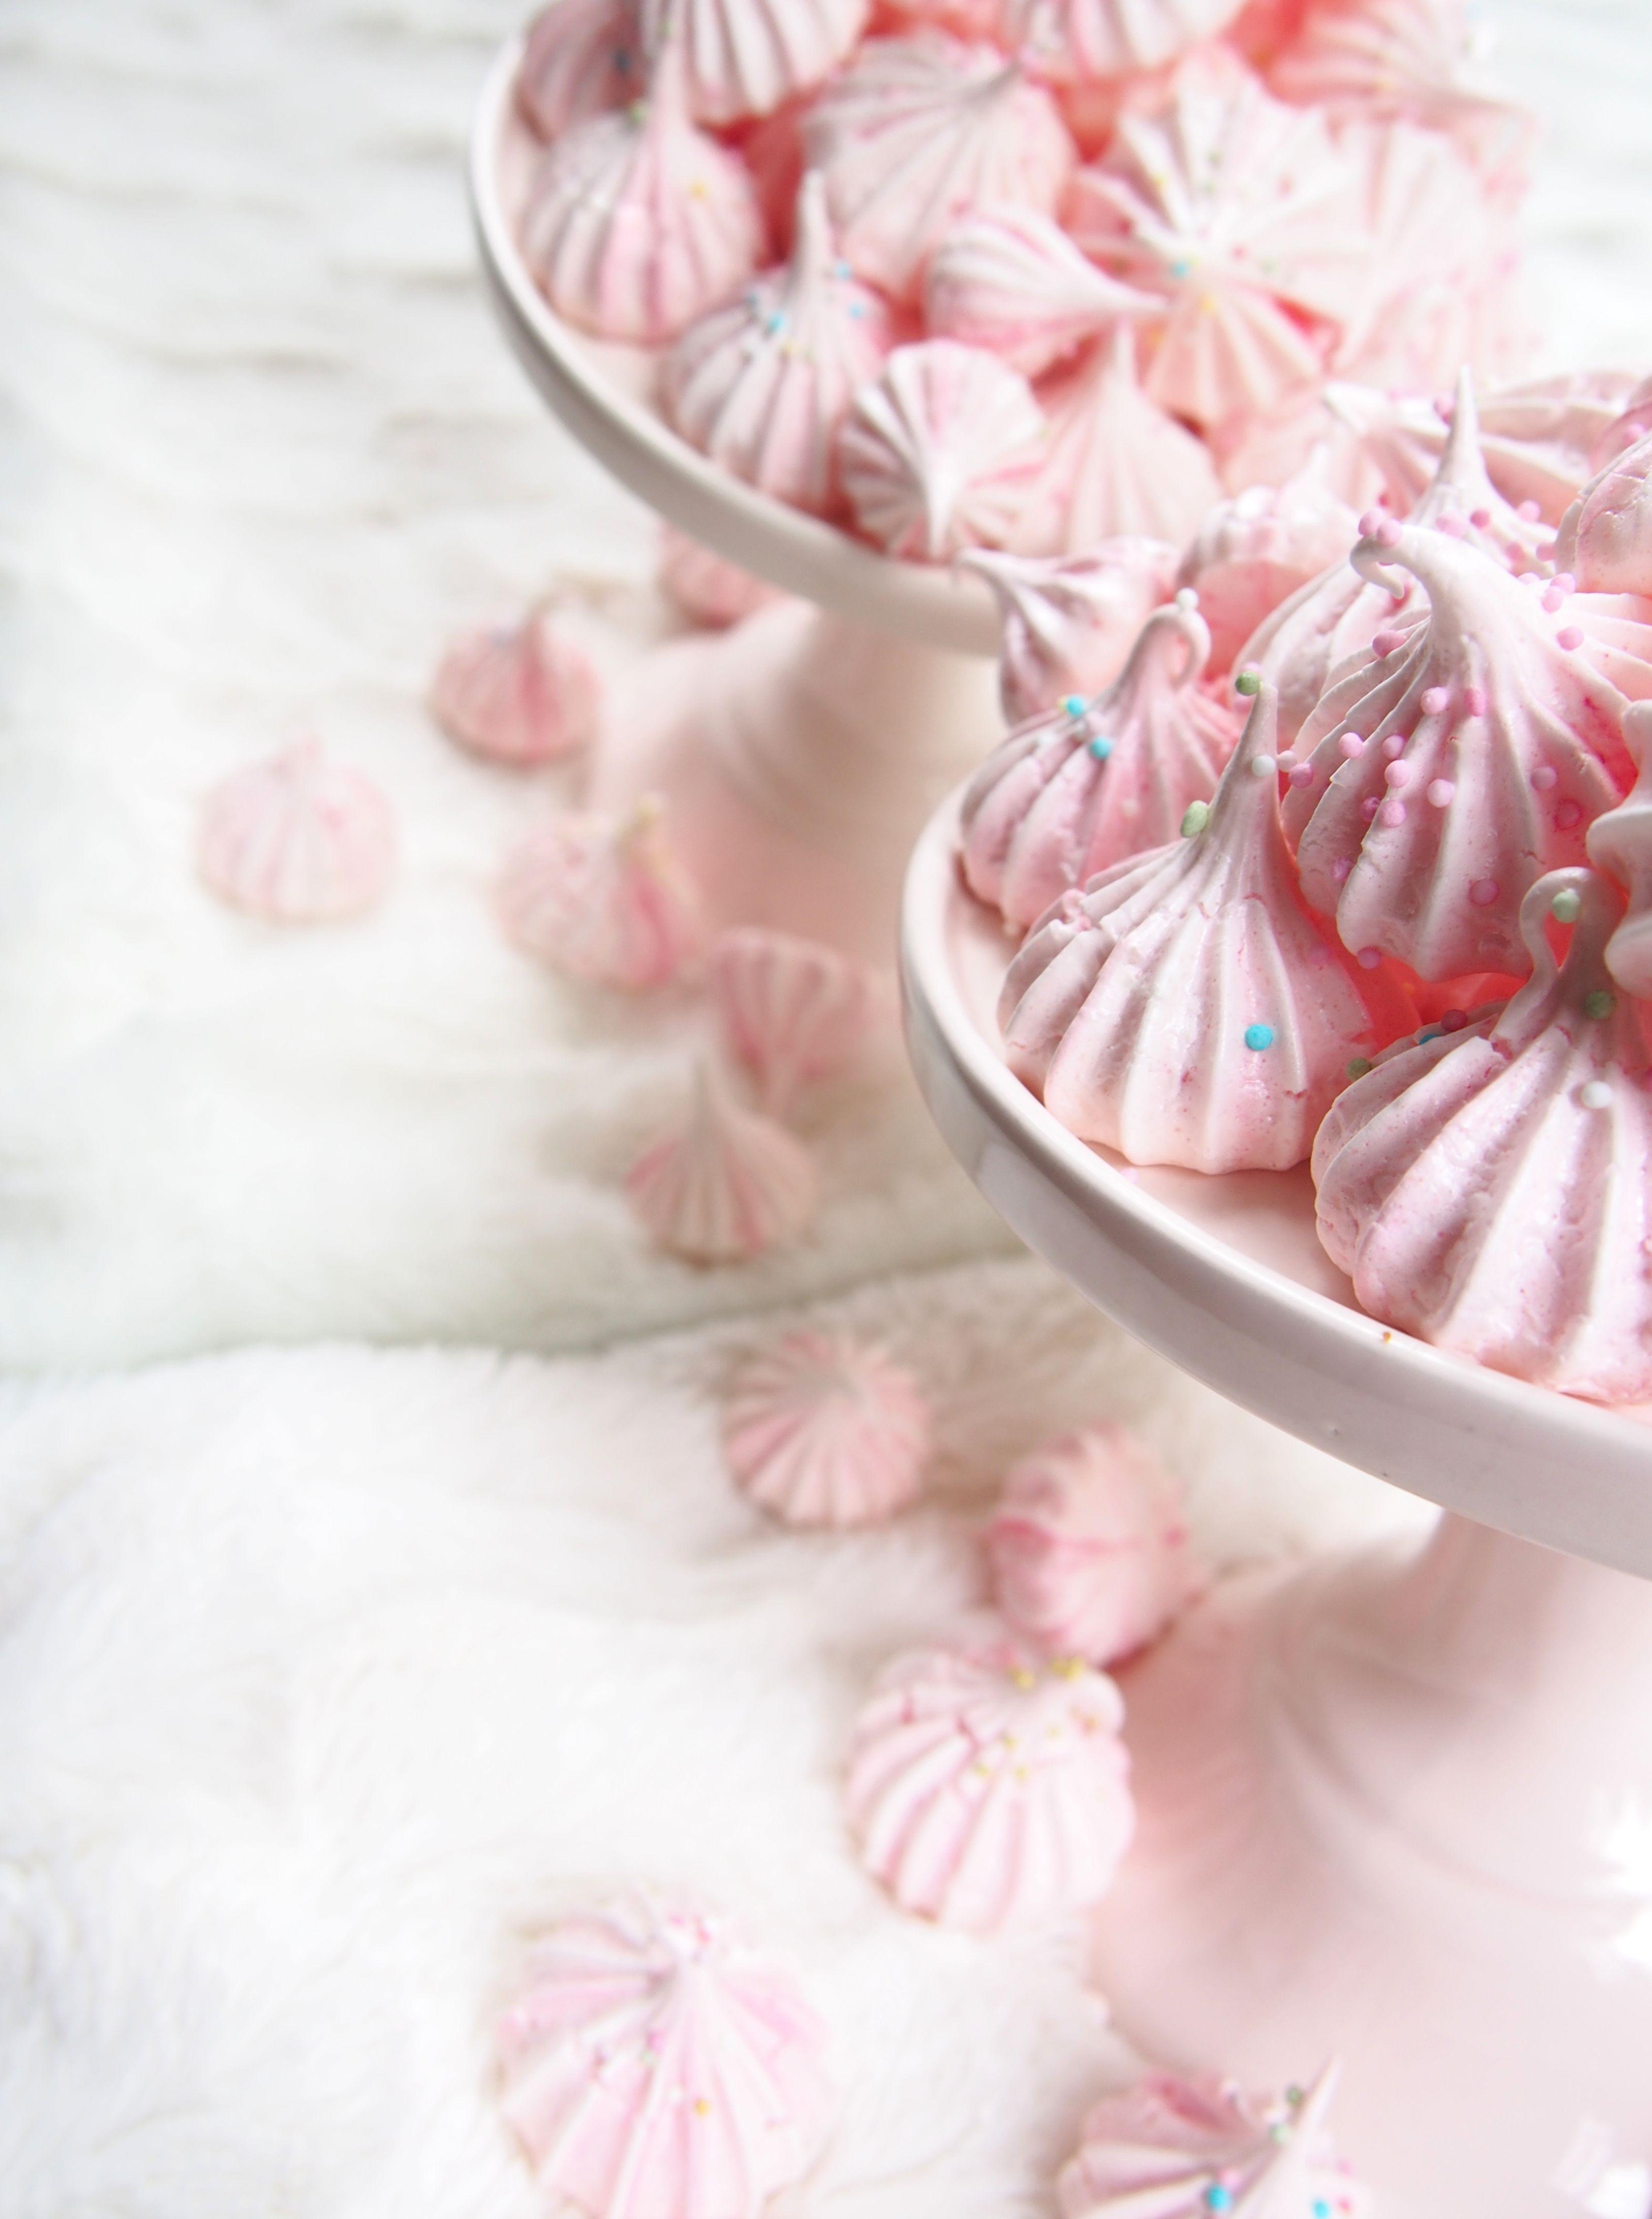 Bubblegum meringues